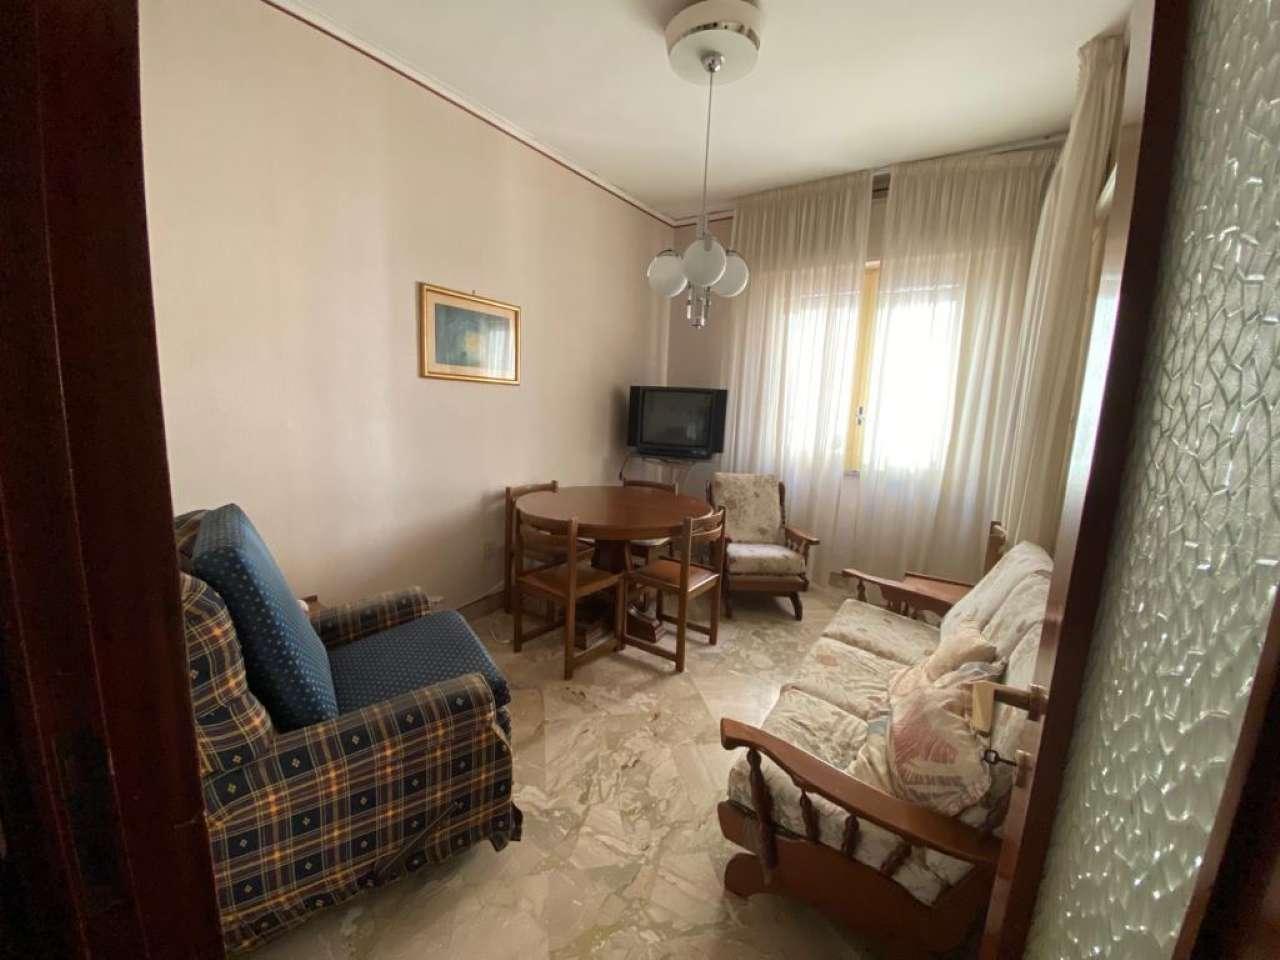 Quadrilocale, Via Angelo Callimaco, Quartiere Noce, Palermo, foto 3